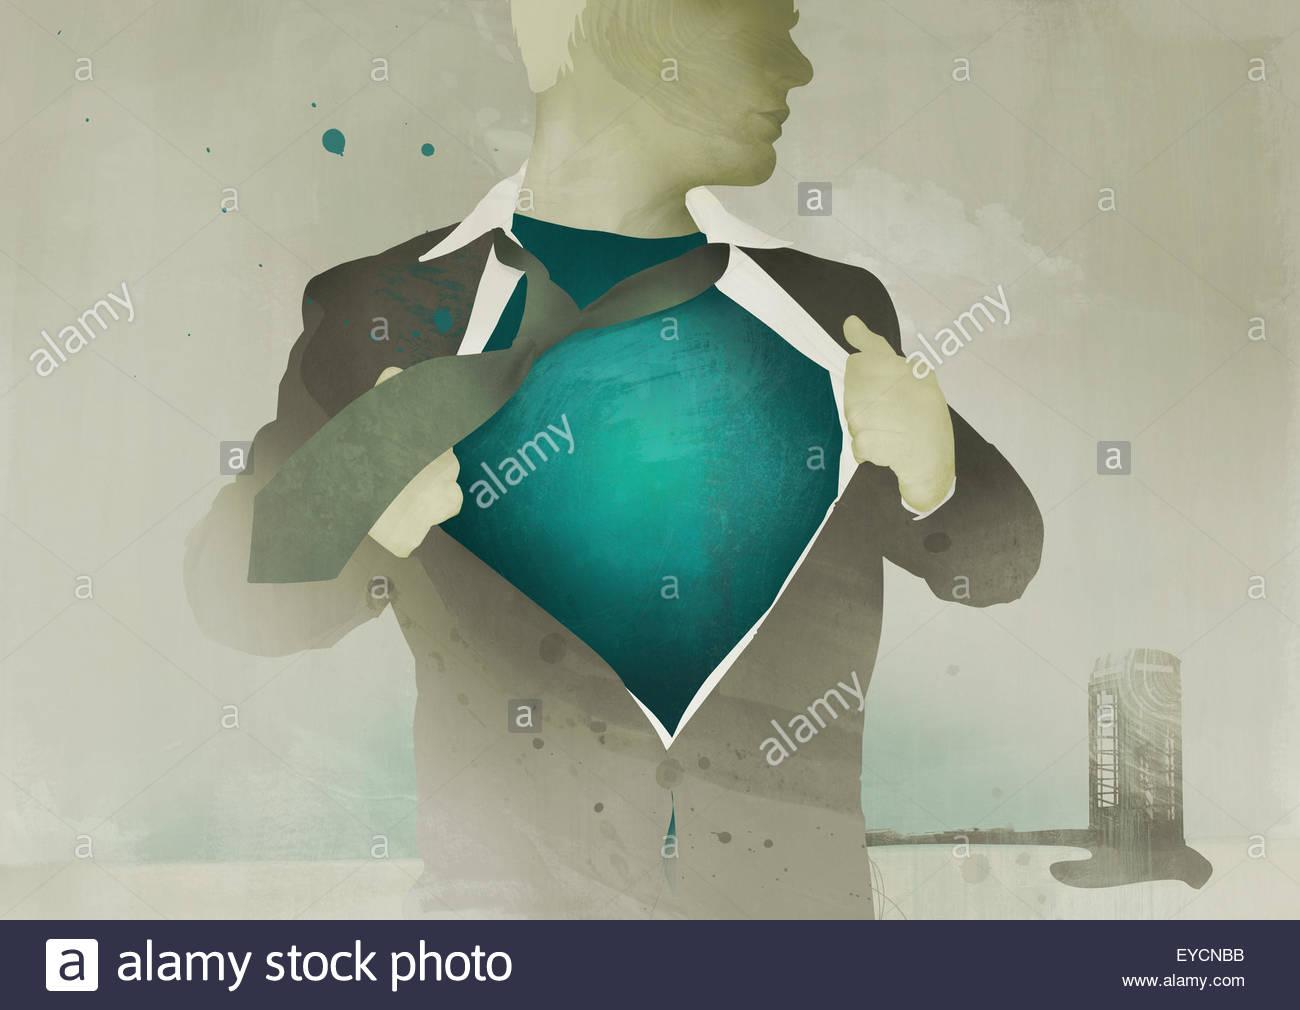 Businessman revealing superhero costume under suit - Stock Image